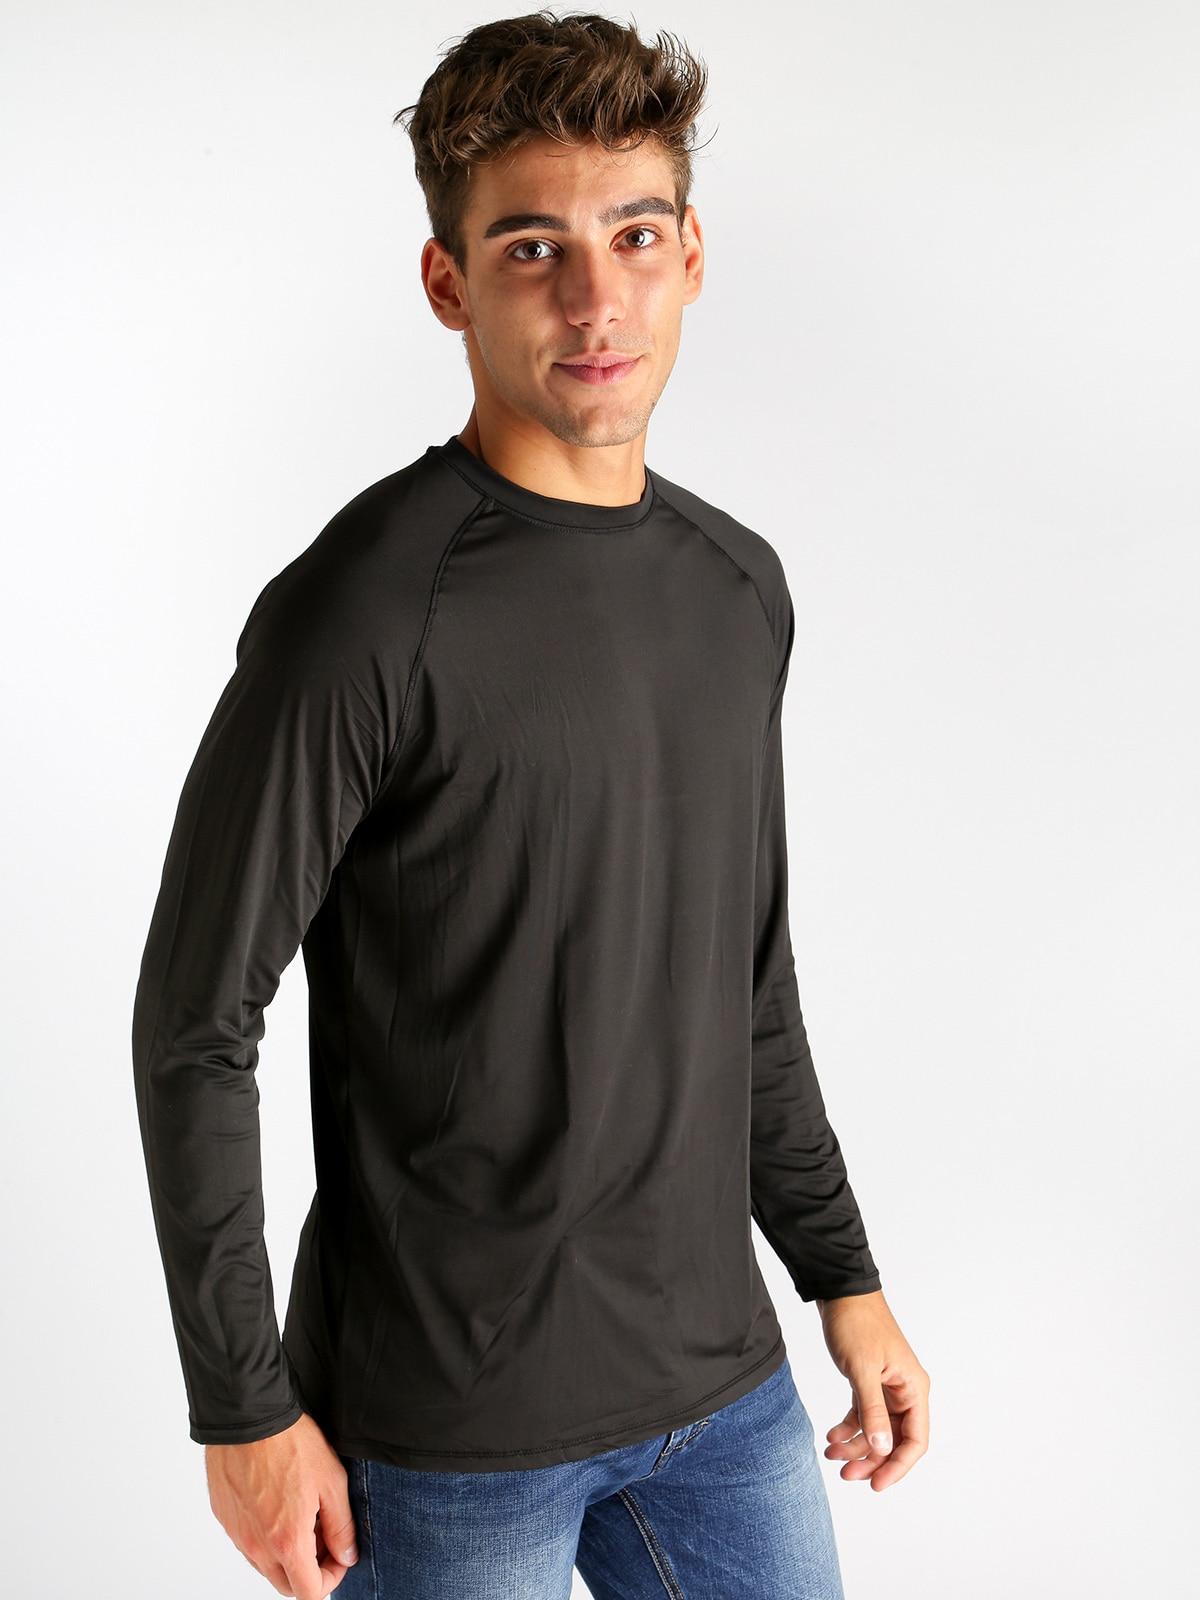 Technical Fabric Long Sleeve T Shirt